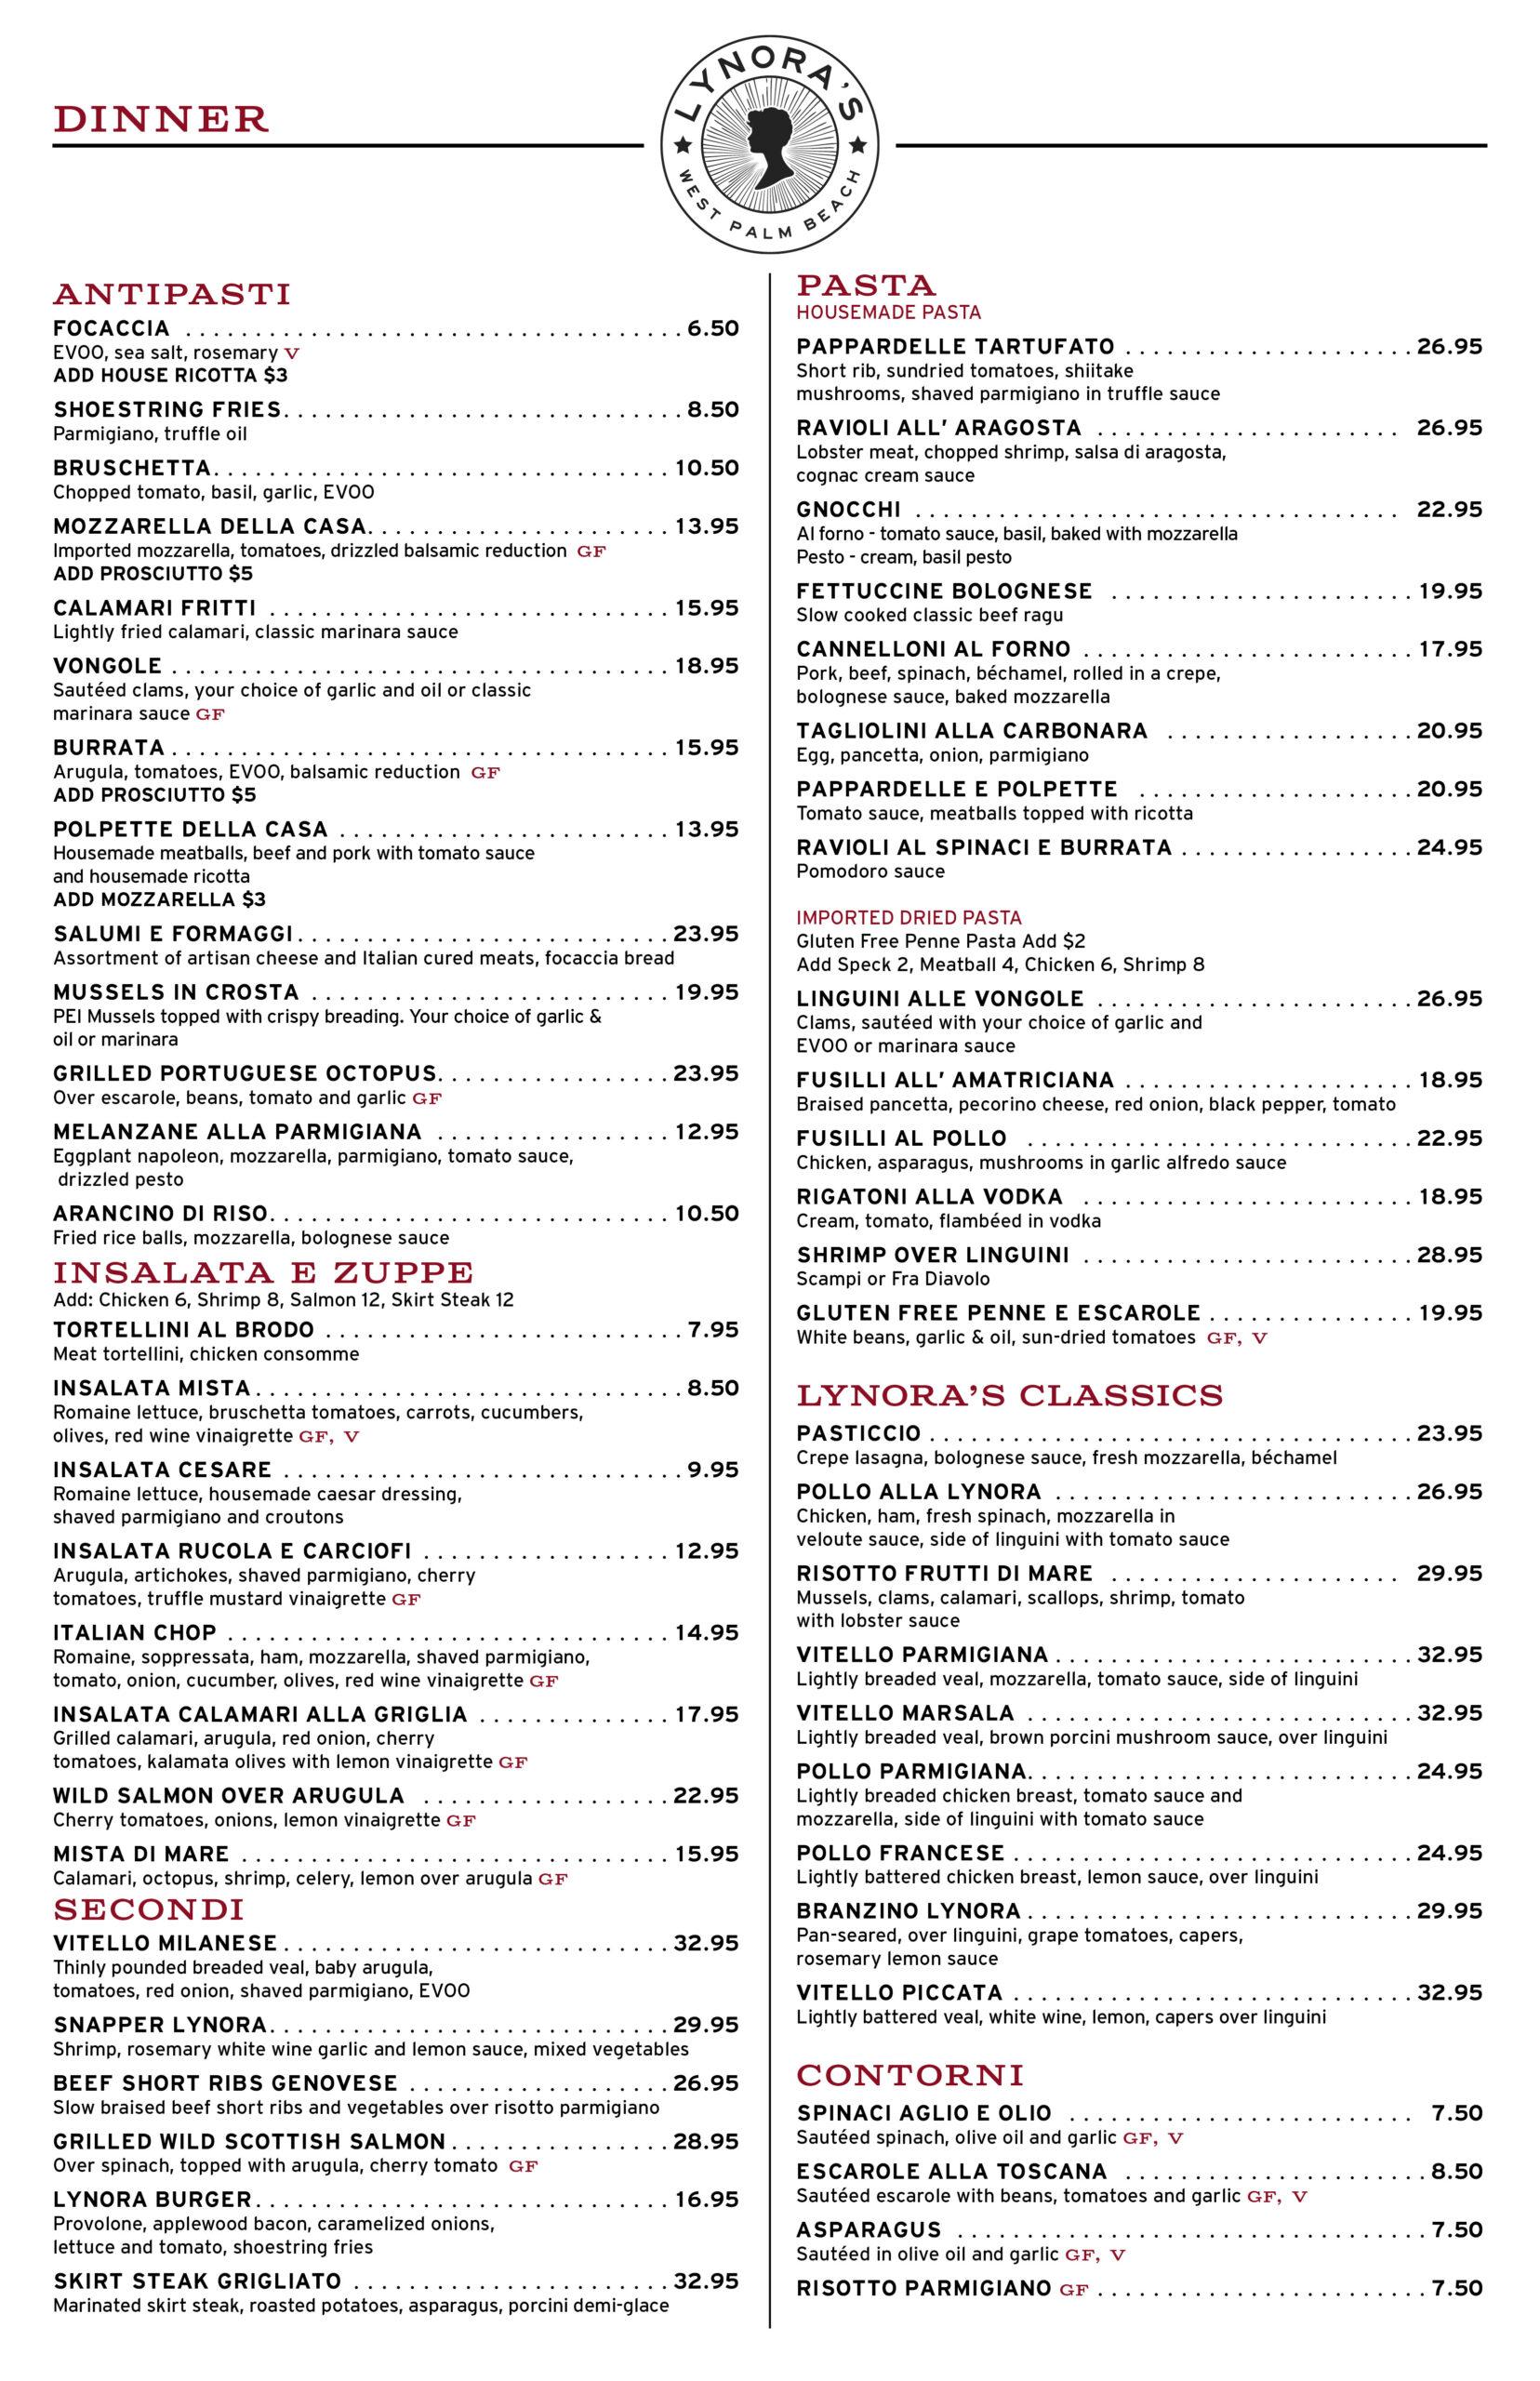 Lynoras Dinner Menu WPB 031221